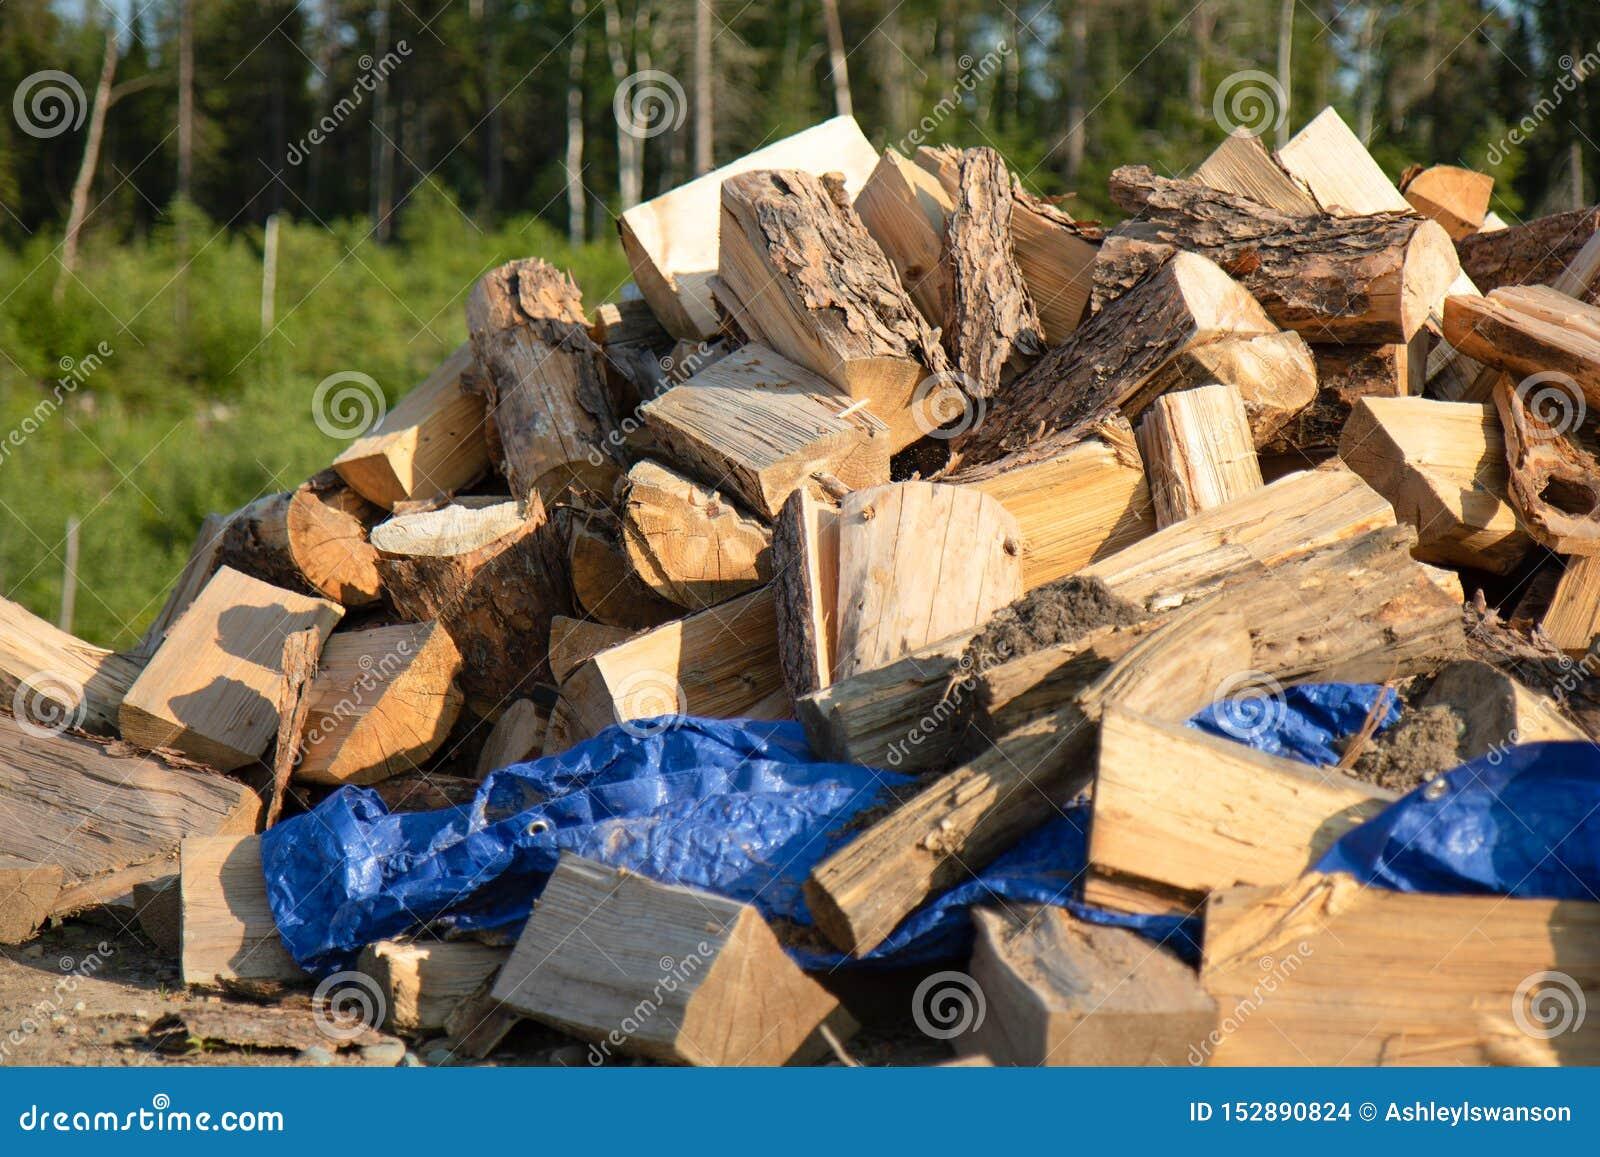 Ein großer Stapel des Holzes im Sommer